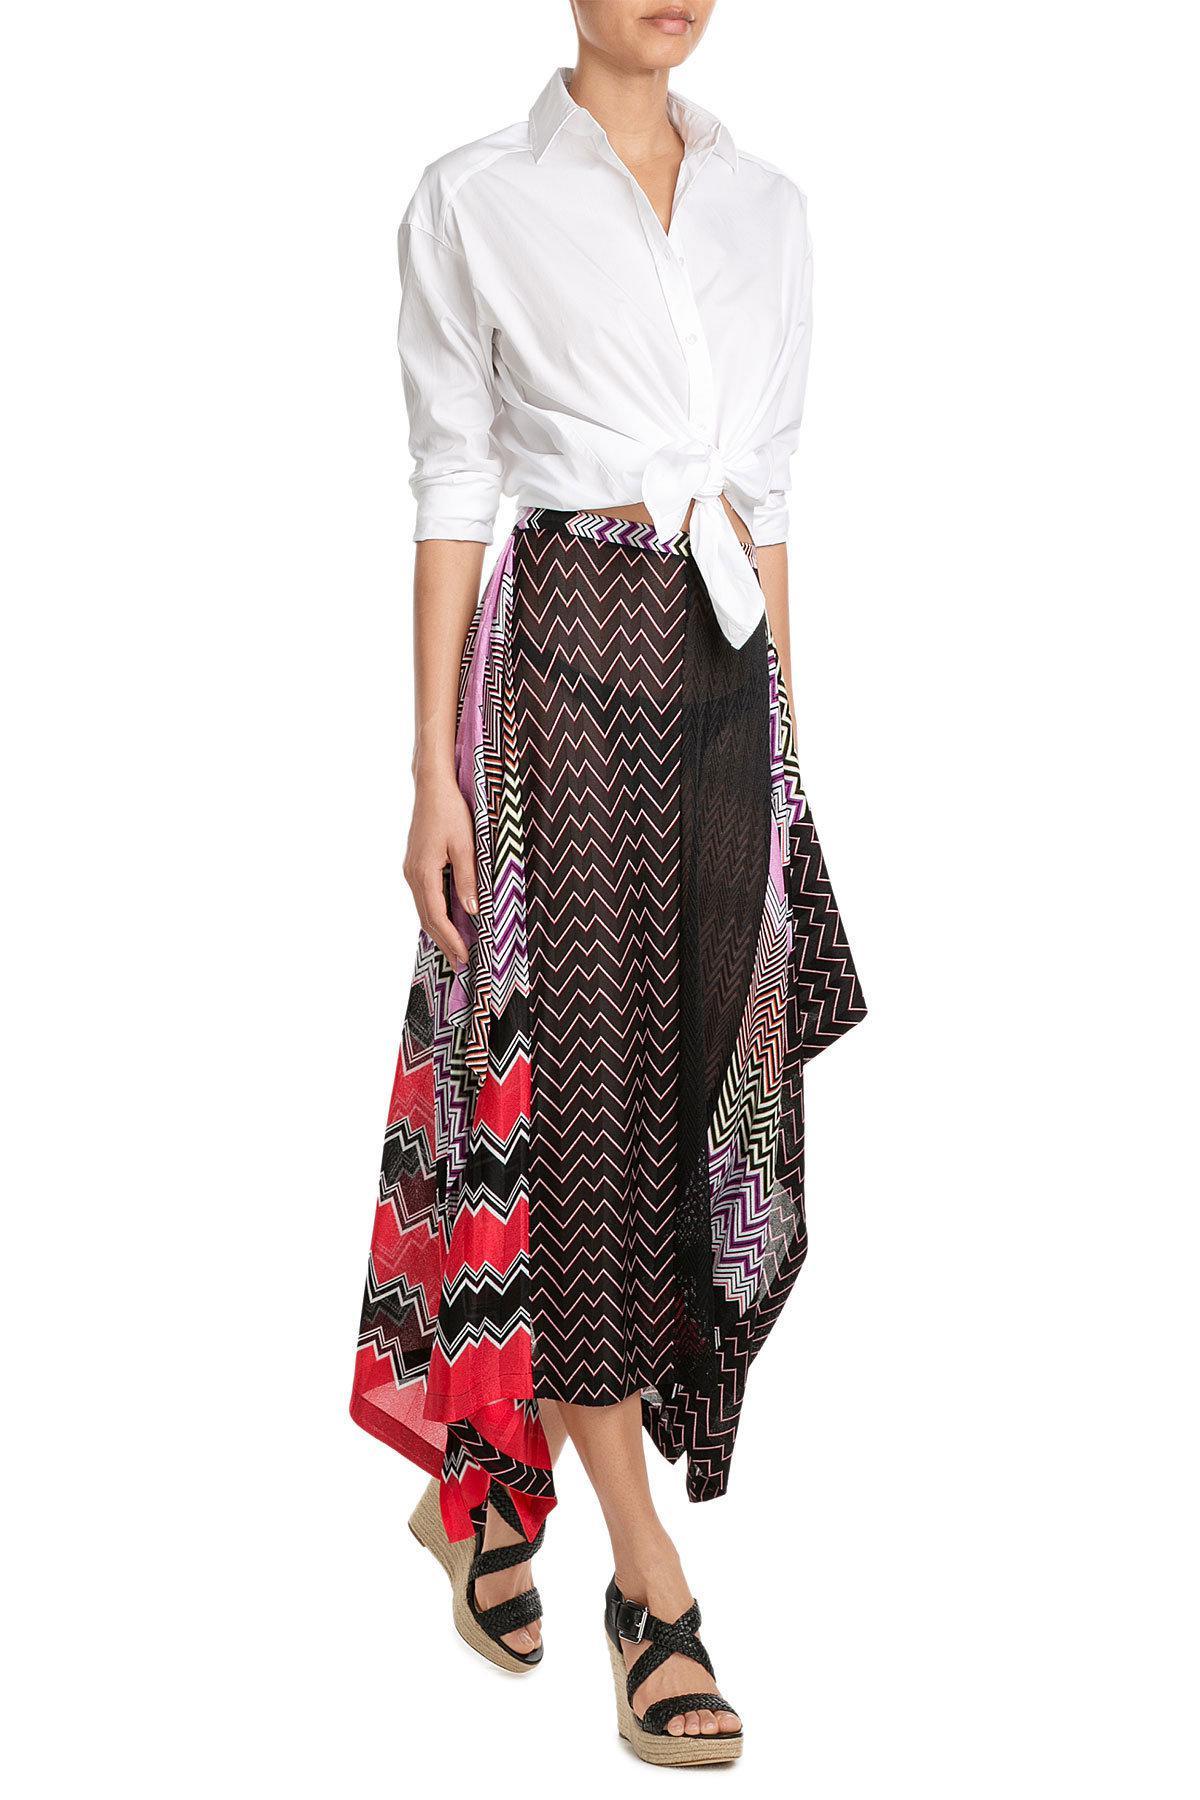 Missoni - Multicolor Draped Midi-skirt With Patchwork Print - Lyst. View  fullscreen 3d1036fd242ed